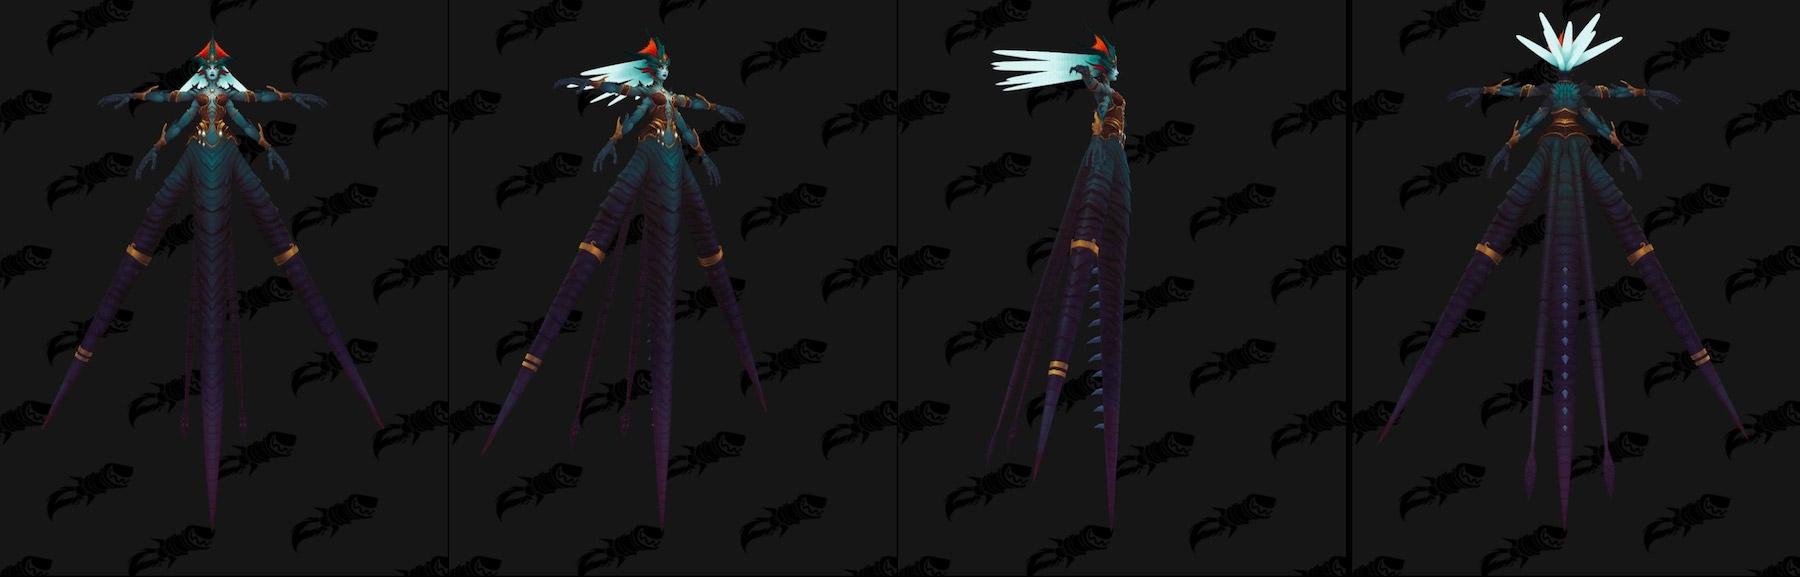 La reine Azshara sera le boss final d'un raid de Battle for Azeroth